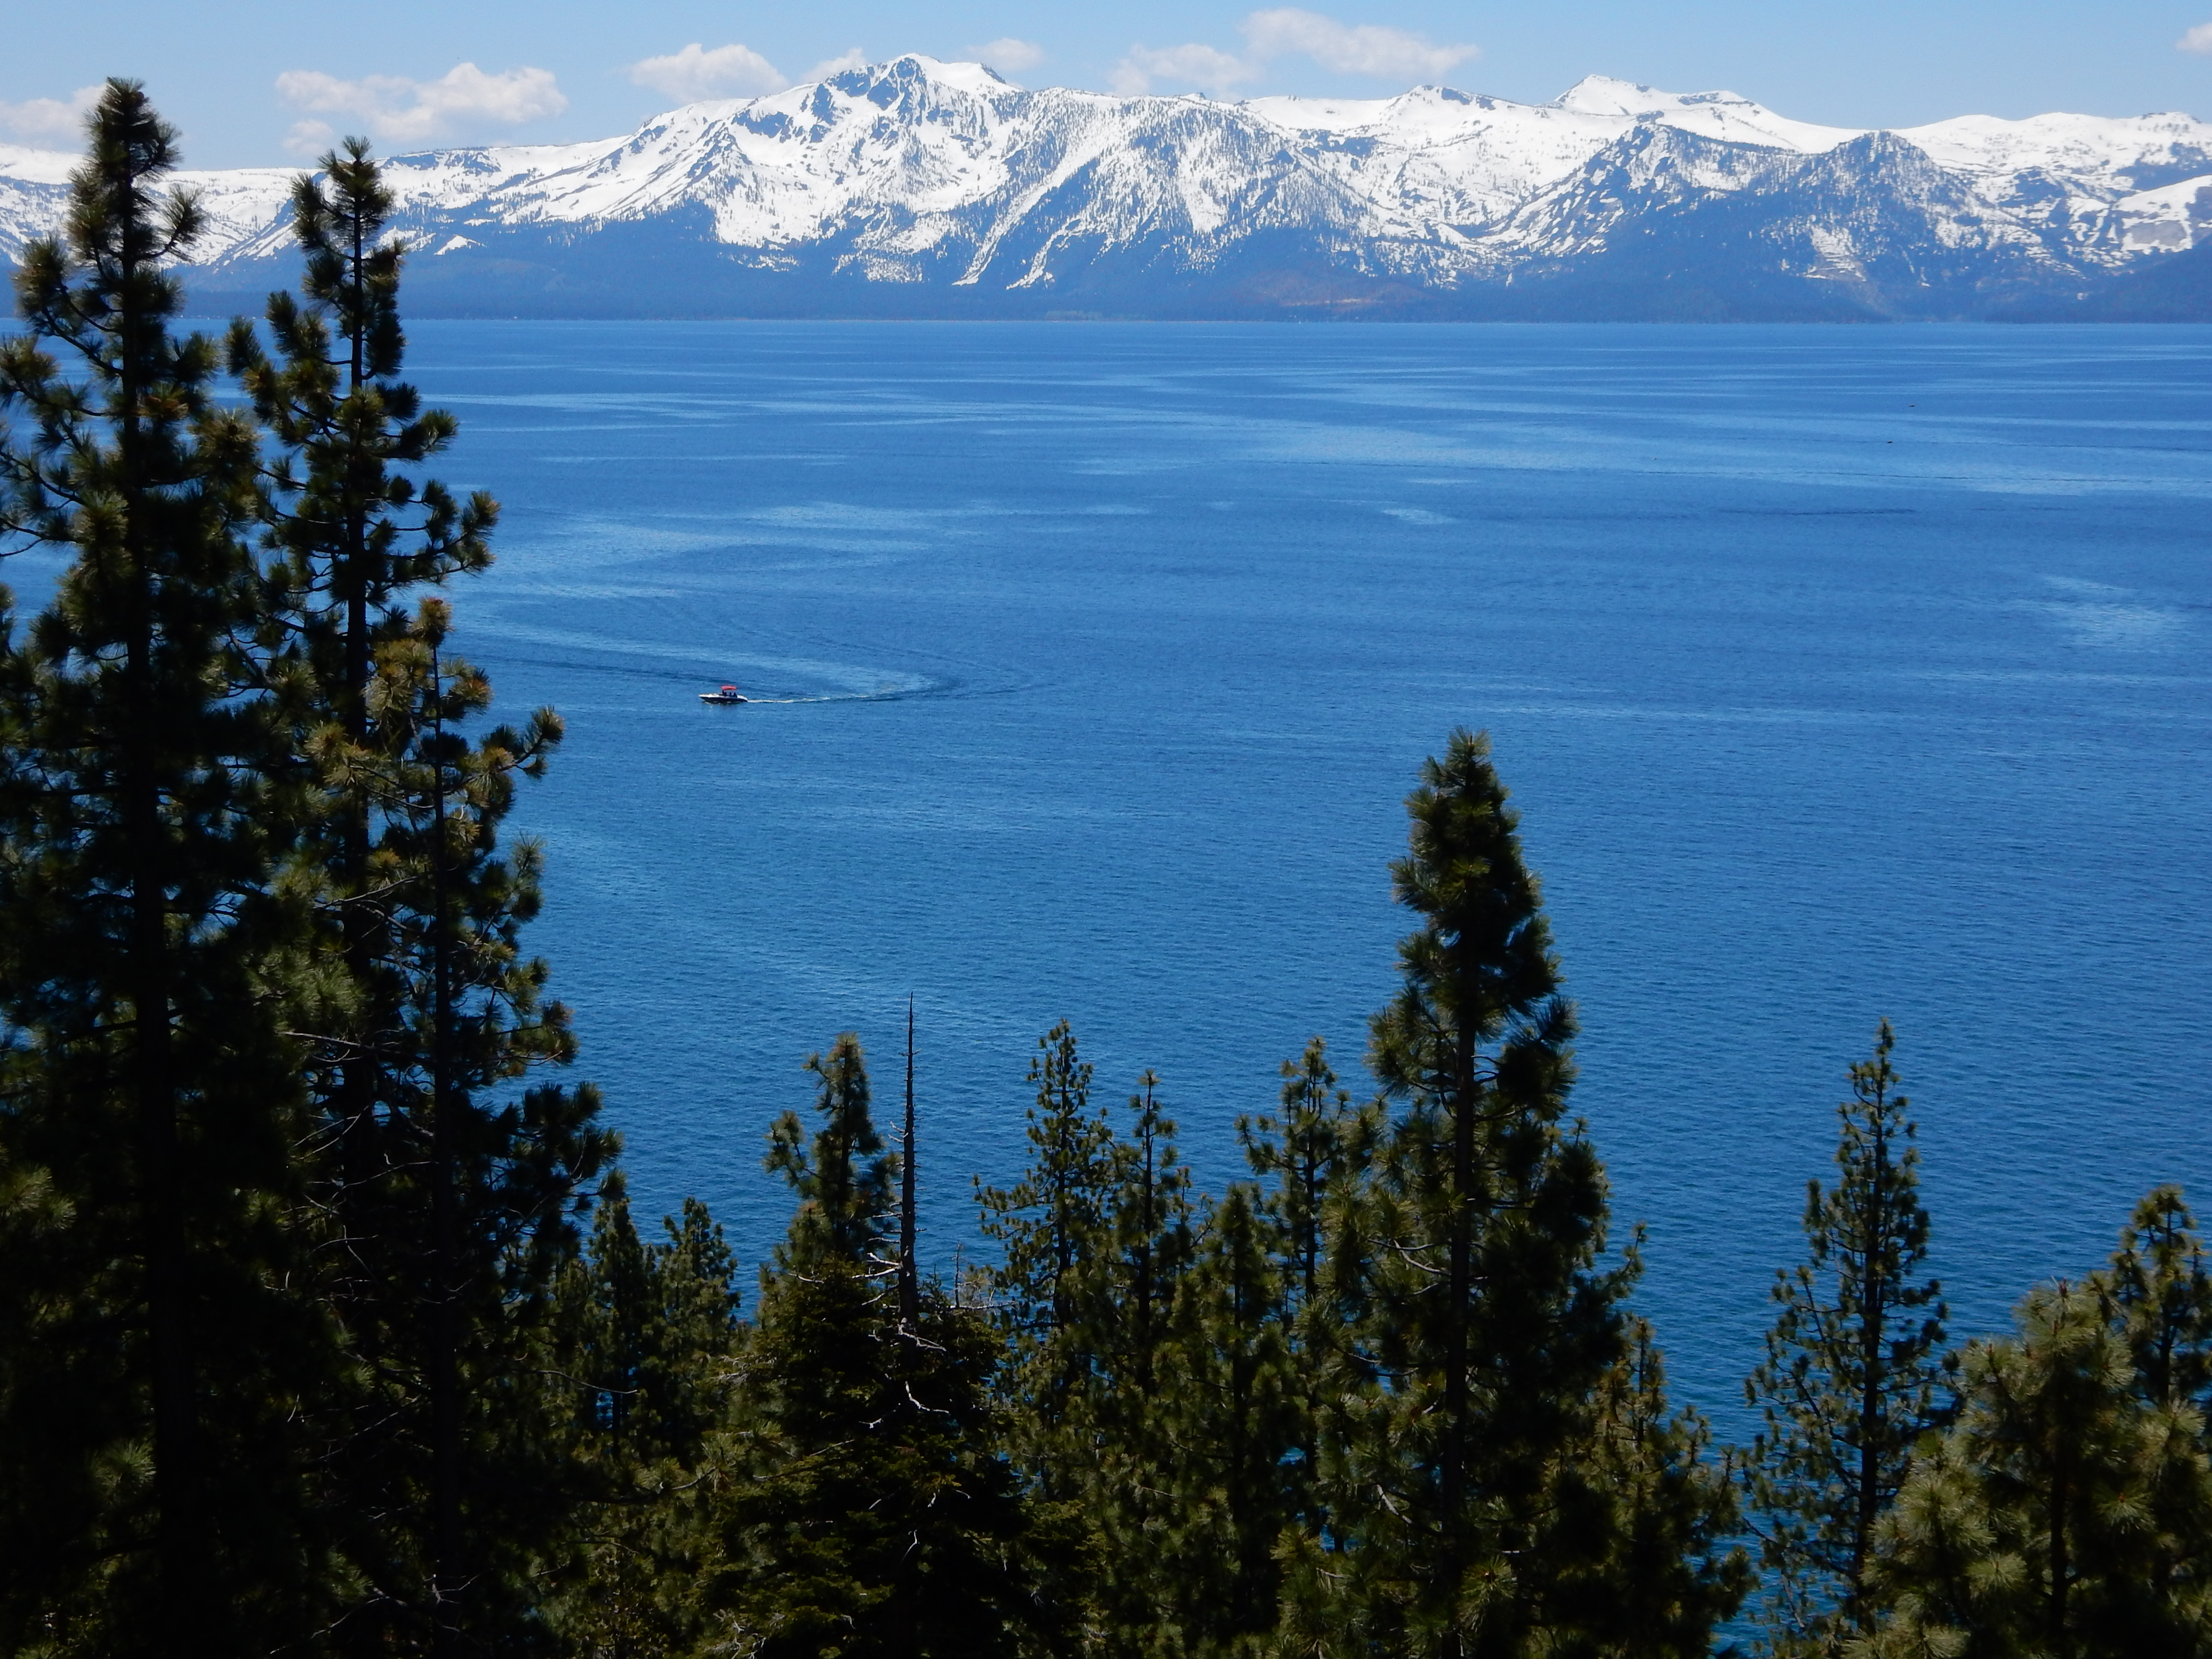 A few of a boat cruising around Lake Tahoe.